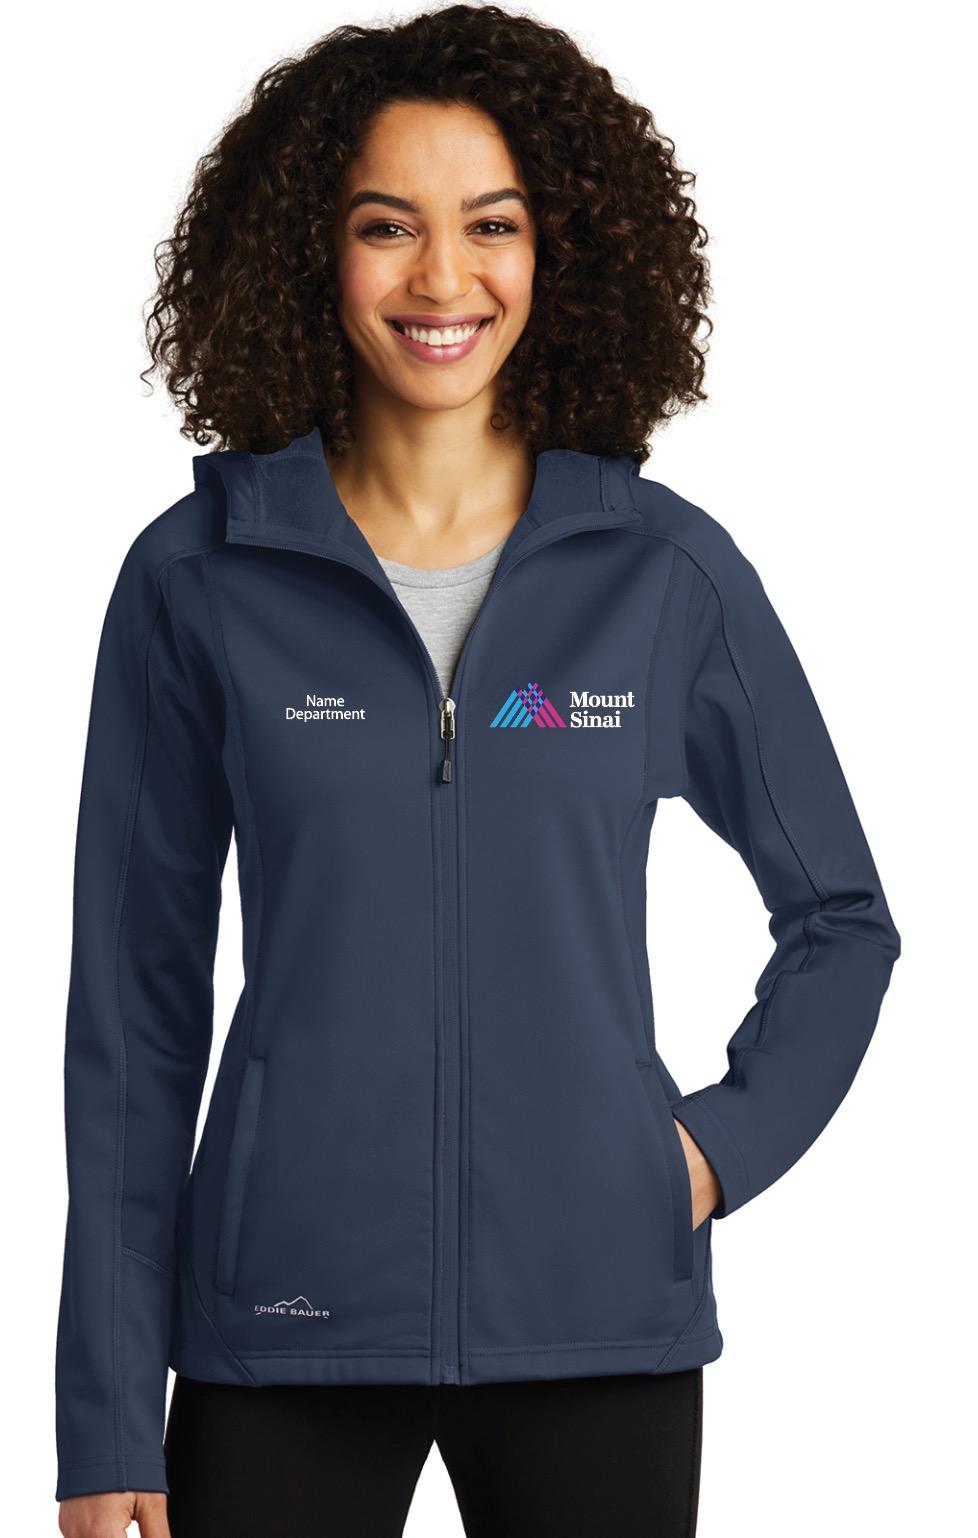 Mount Sinai Beth Israel Eddie Bauer Ladies Hooded Soft Shell Jacket